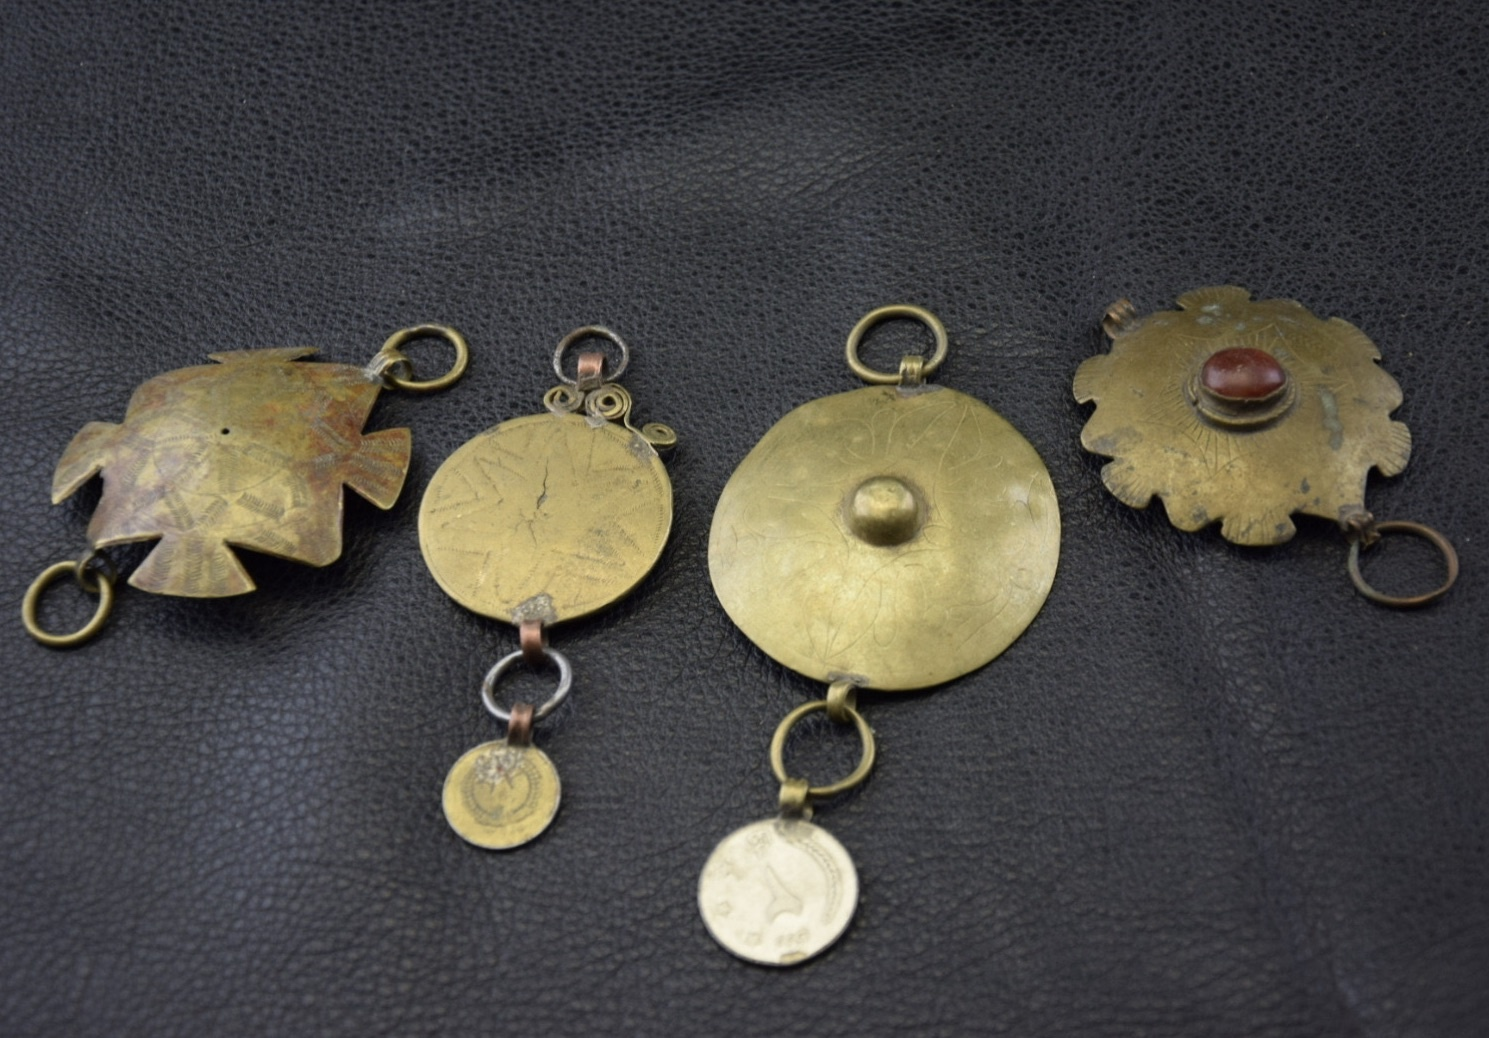 4 pcs Tribal discs